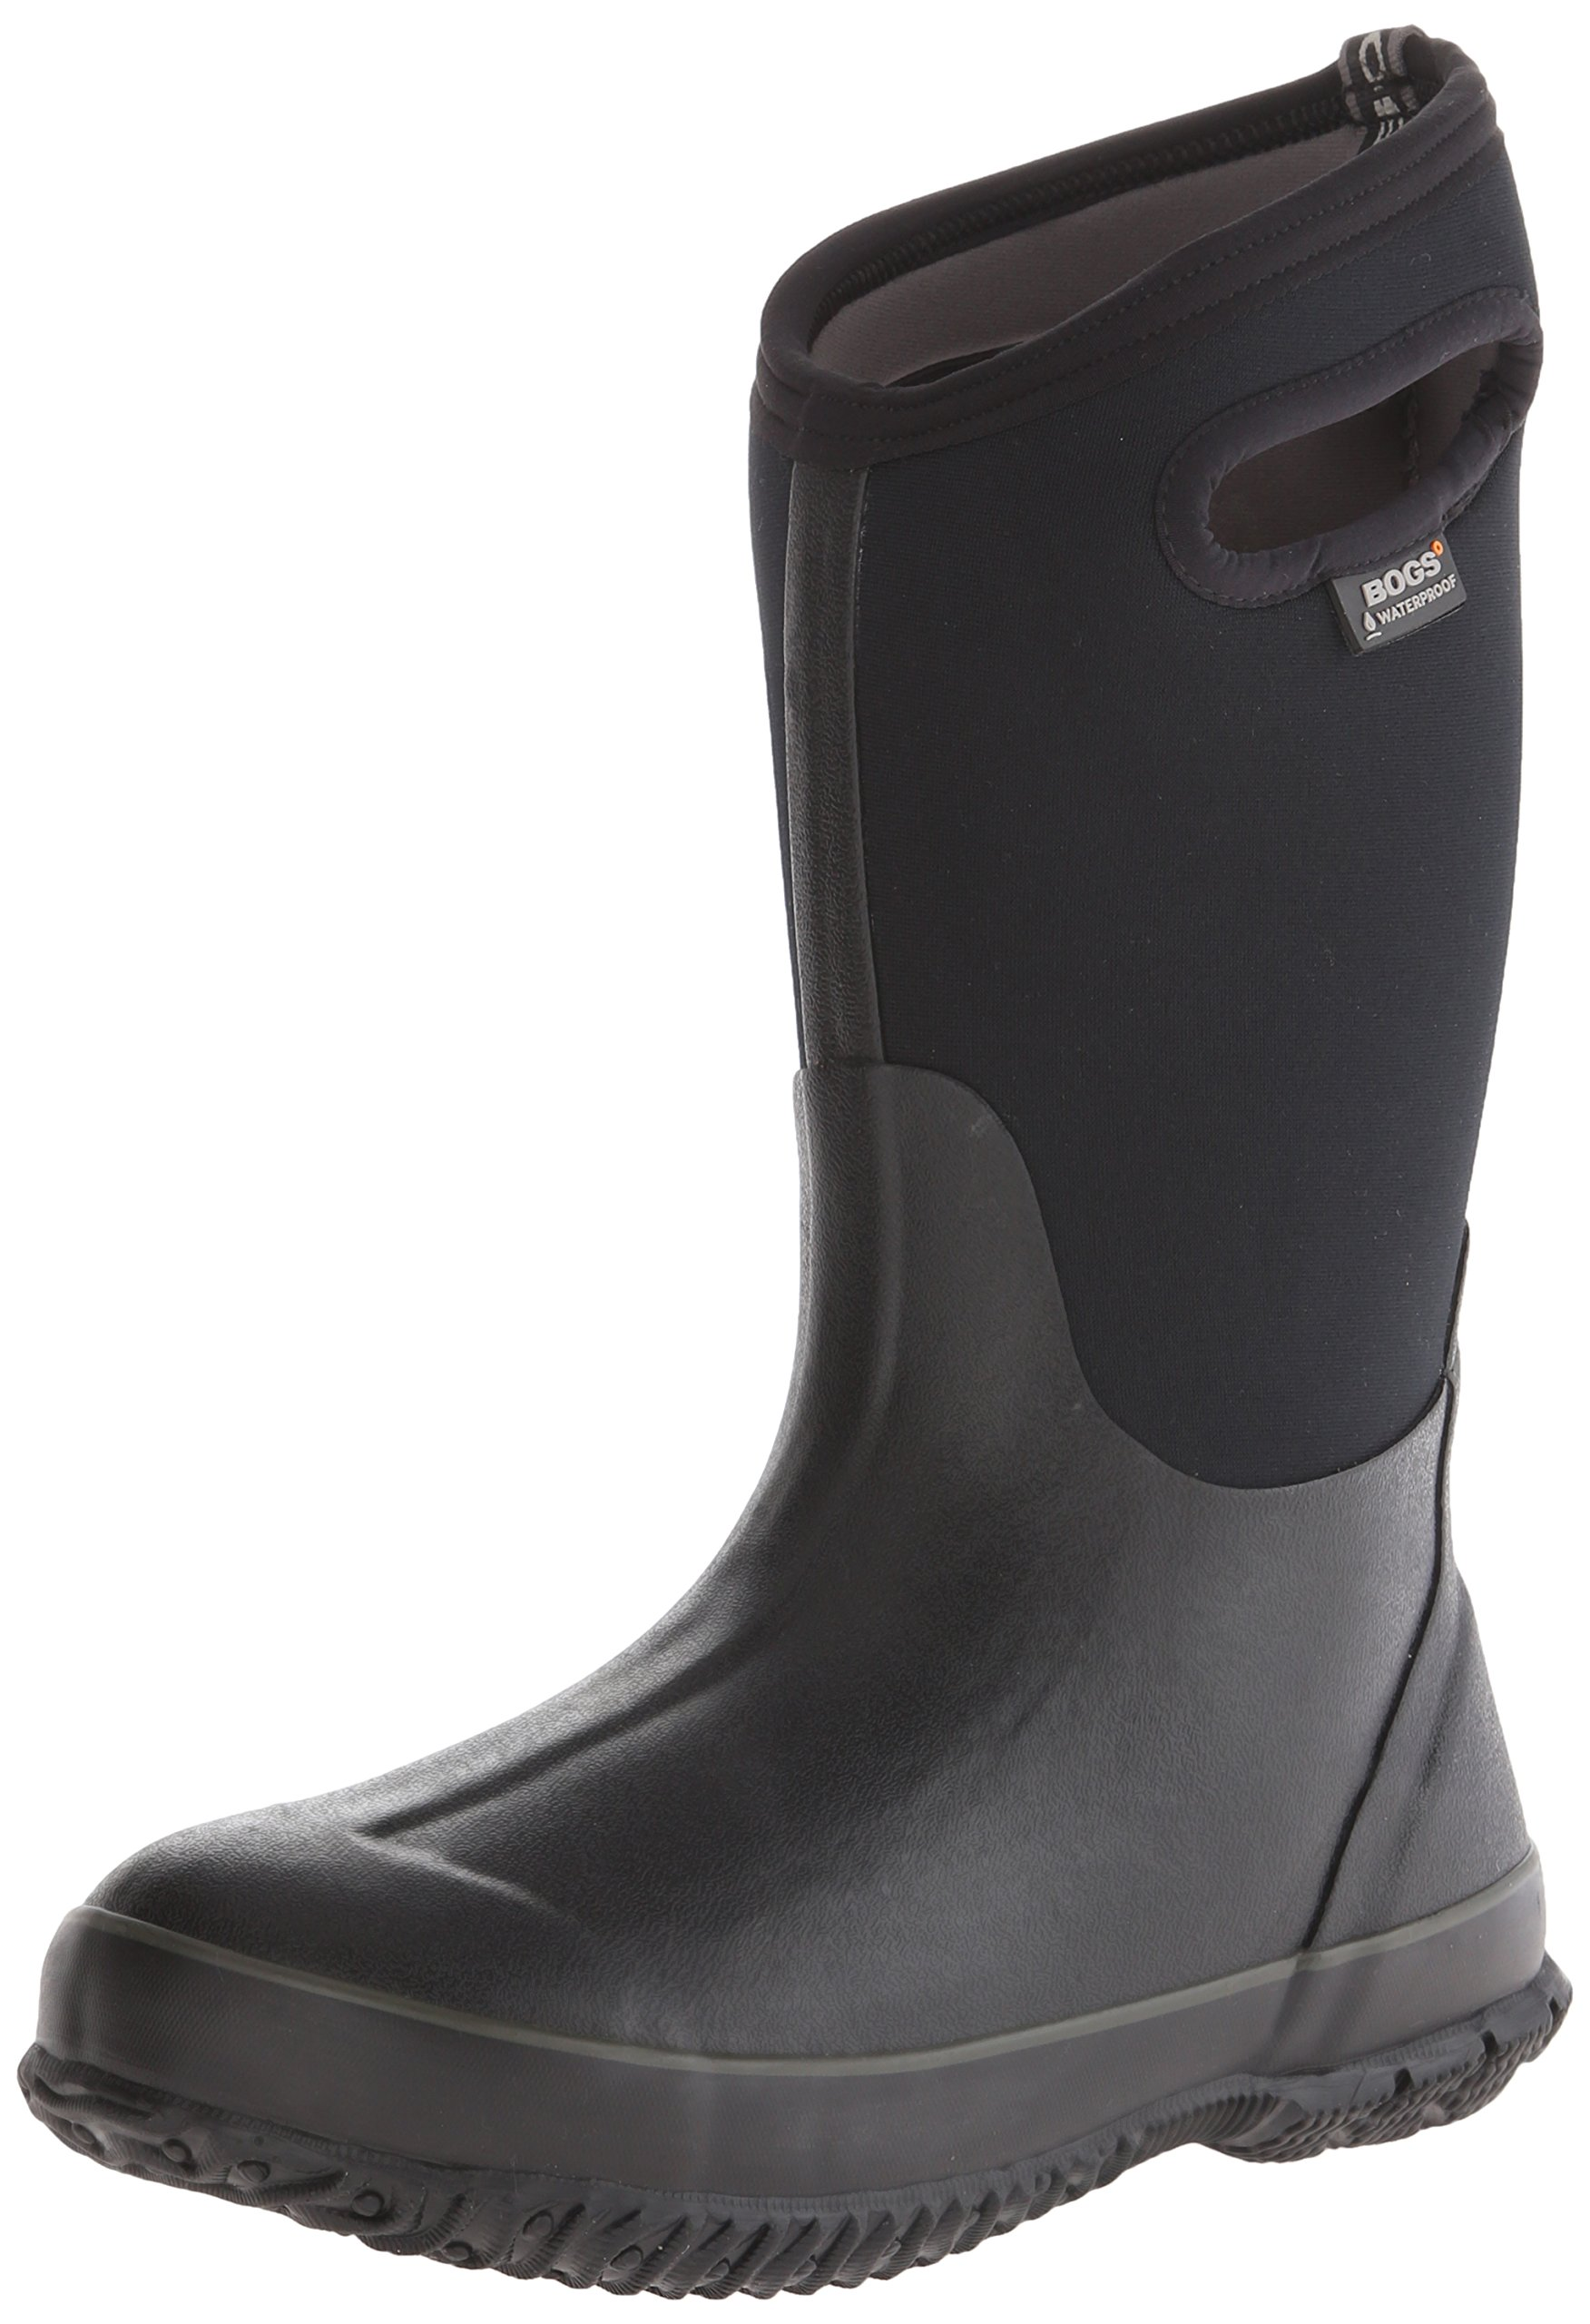 Bogs Kid's Classic High Waterproof Insulated Rubber Neoprene Rain Boot, Black, 7 M US Toddler